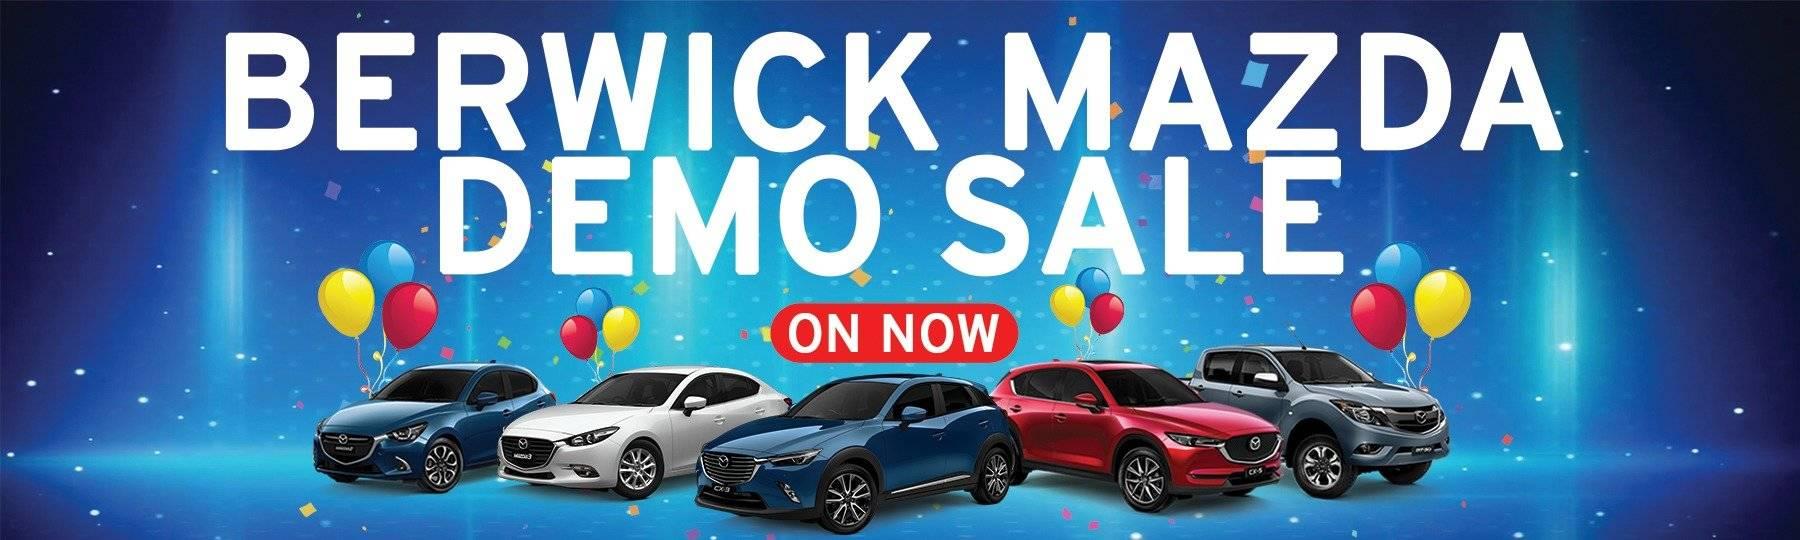 Berwick Mazda Demo Sale